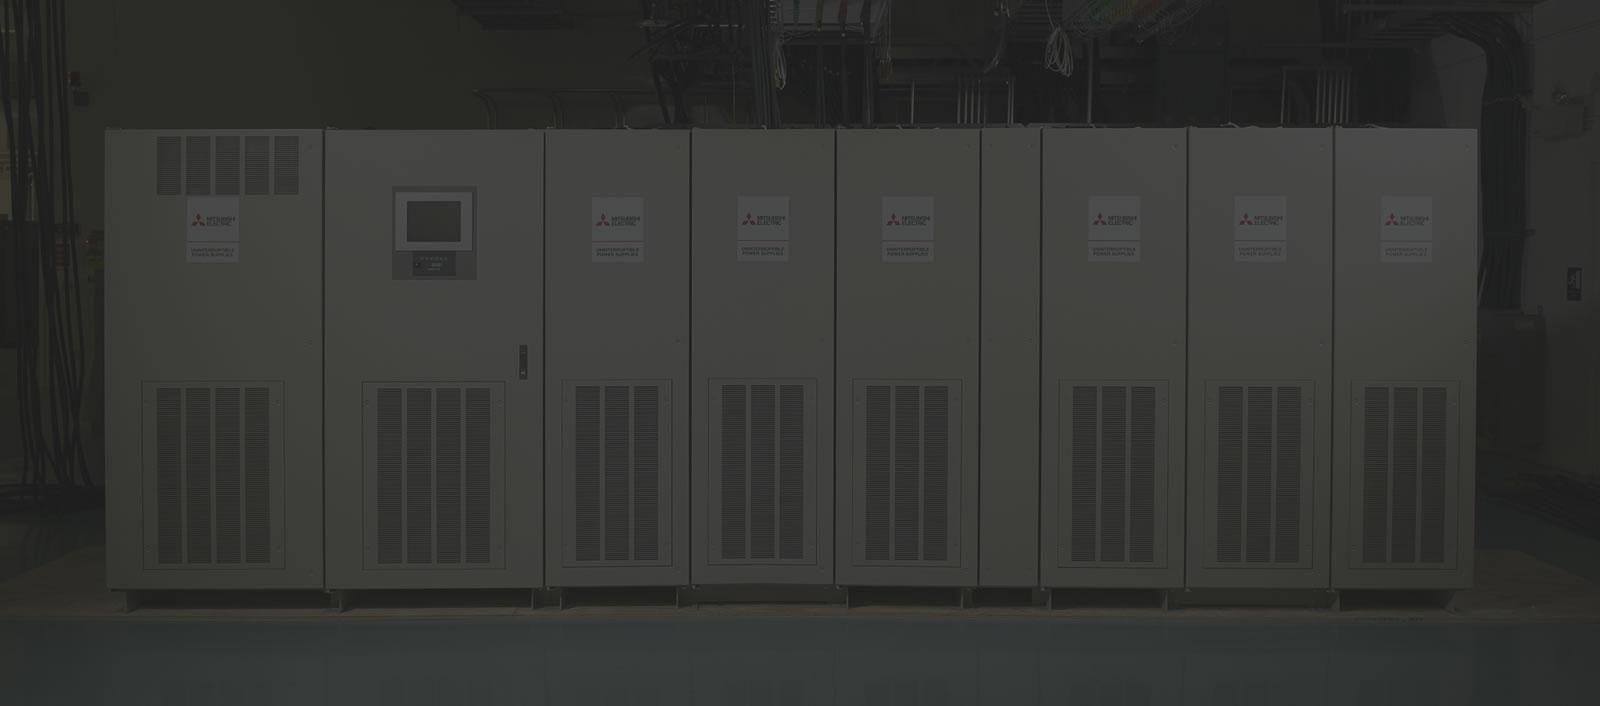 UPS Systems - Uninterruptible Power Supplies